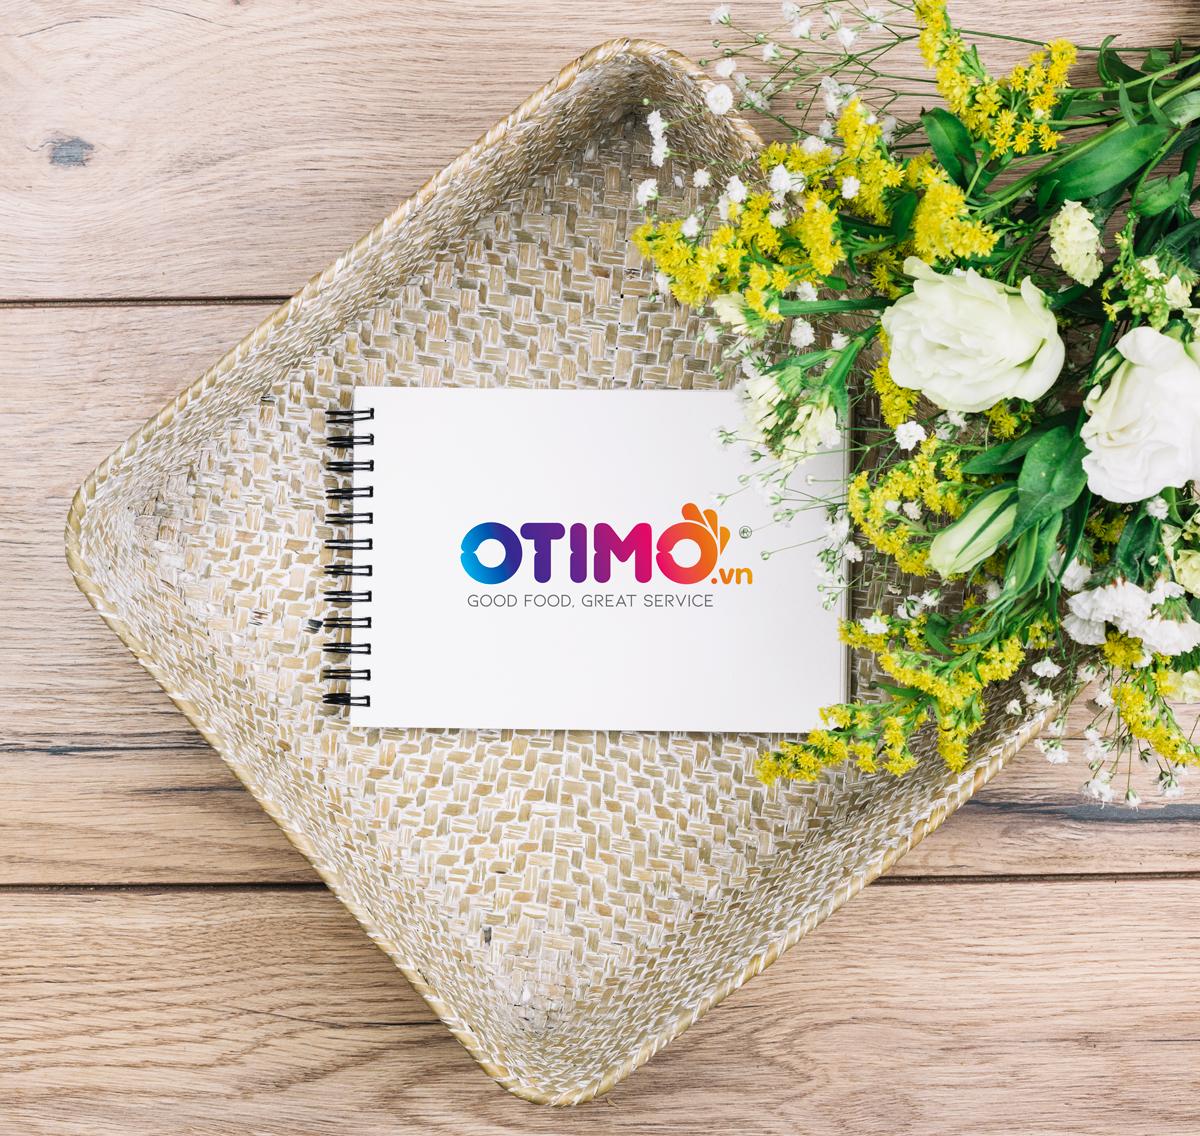 Otimo_thiet_ke_Logo_chuyen_nghiep_gia_tot_7